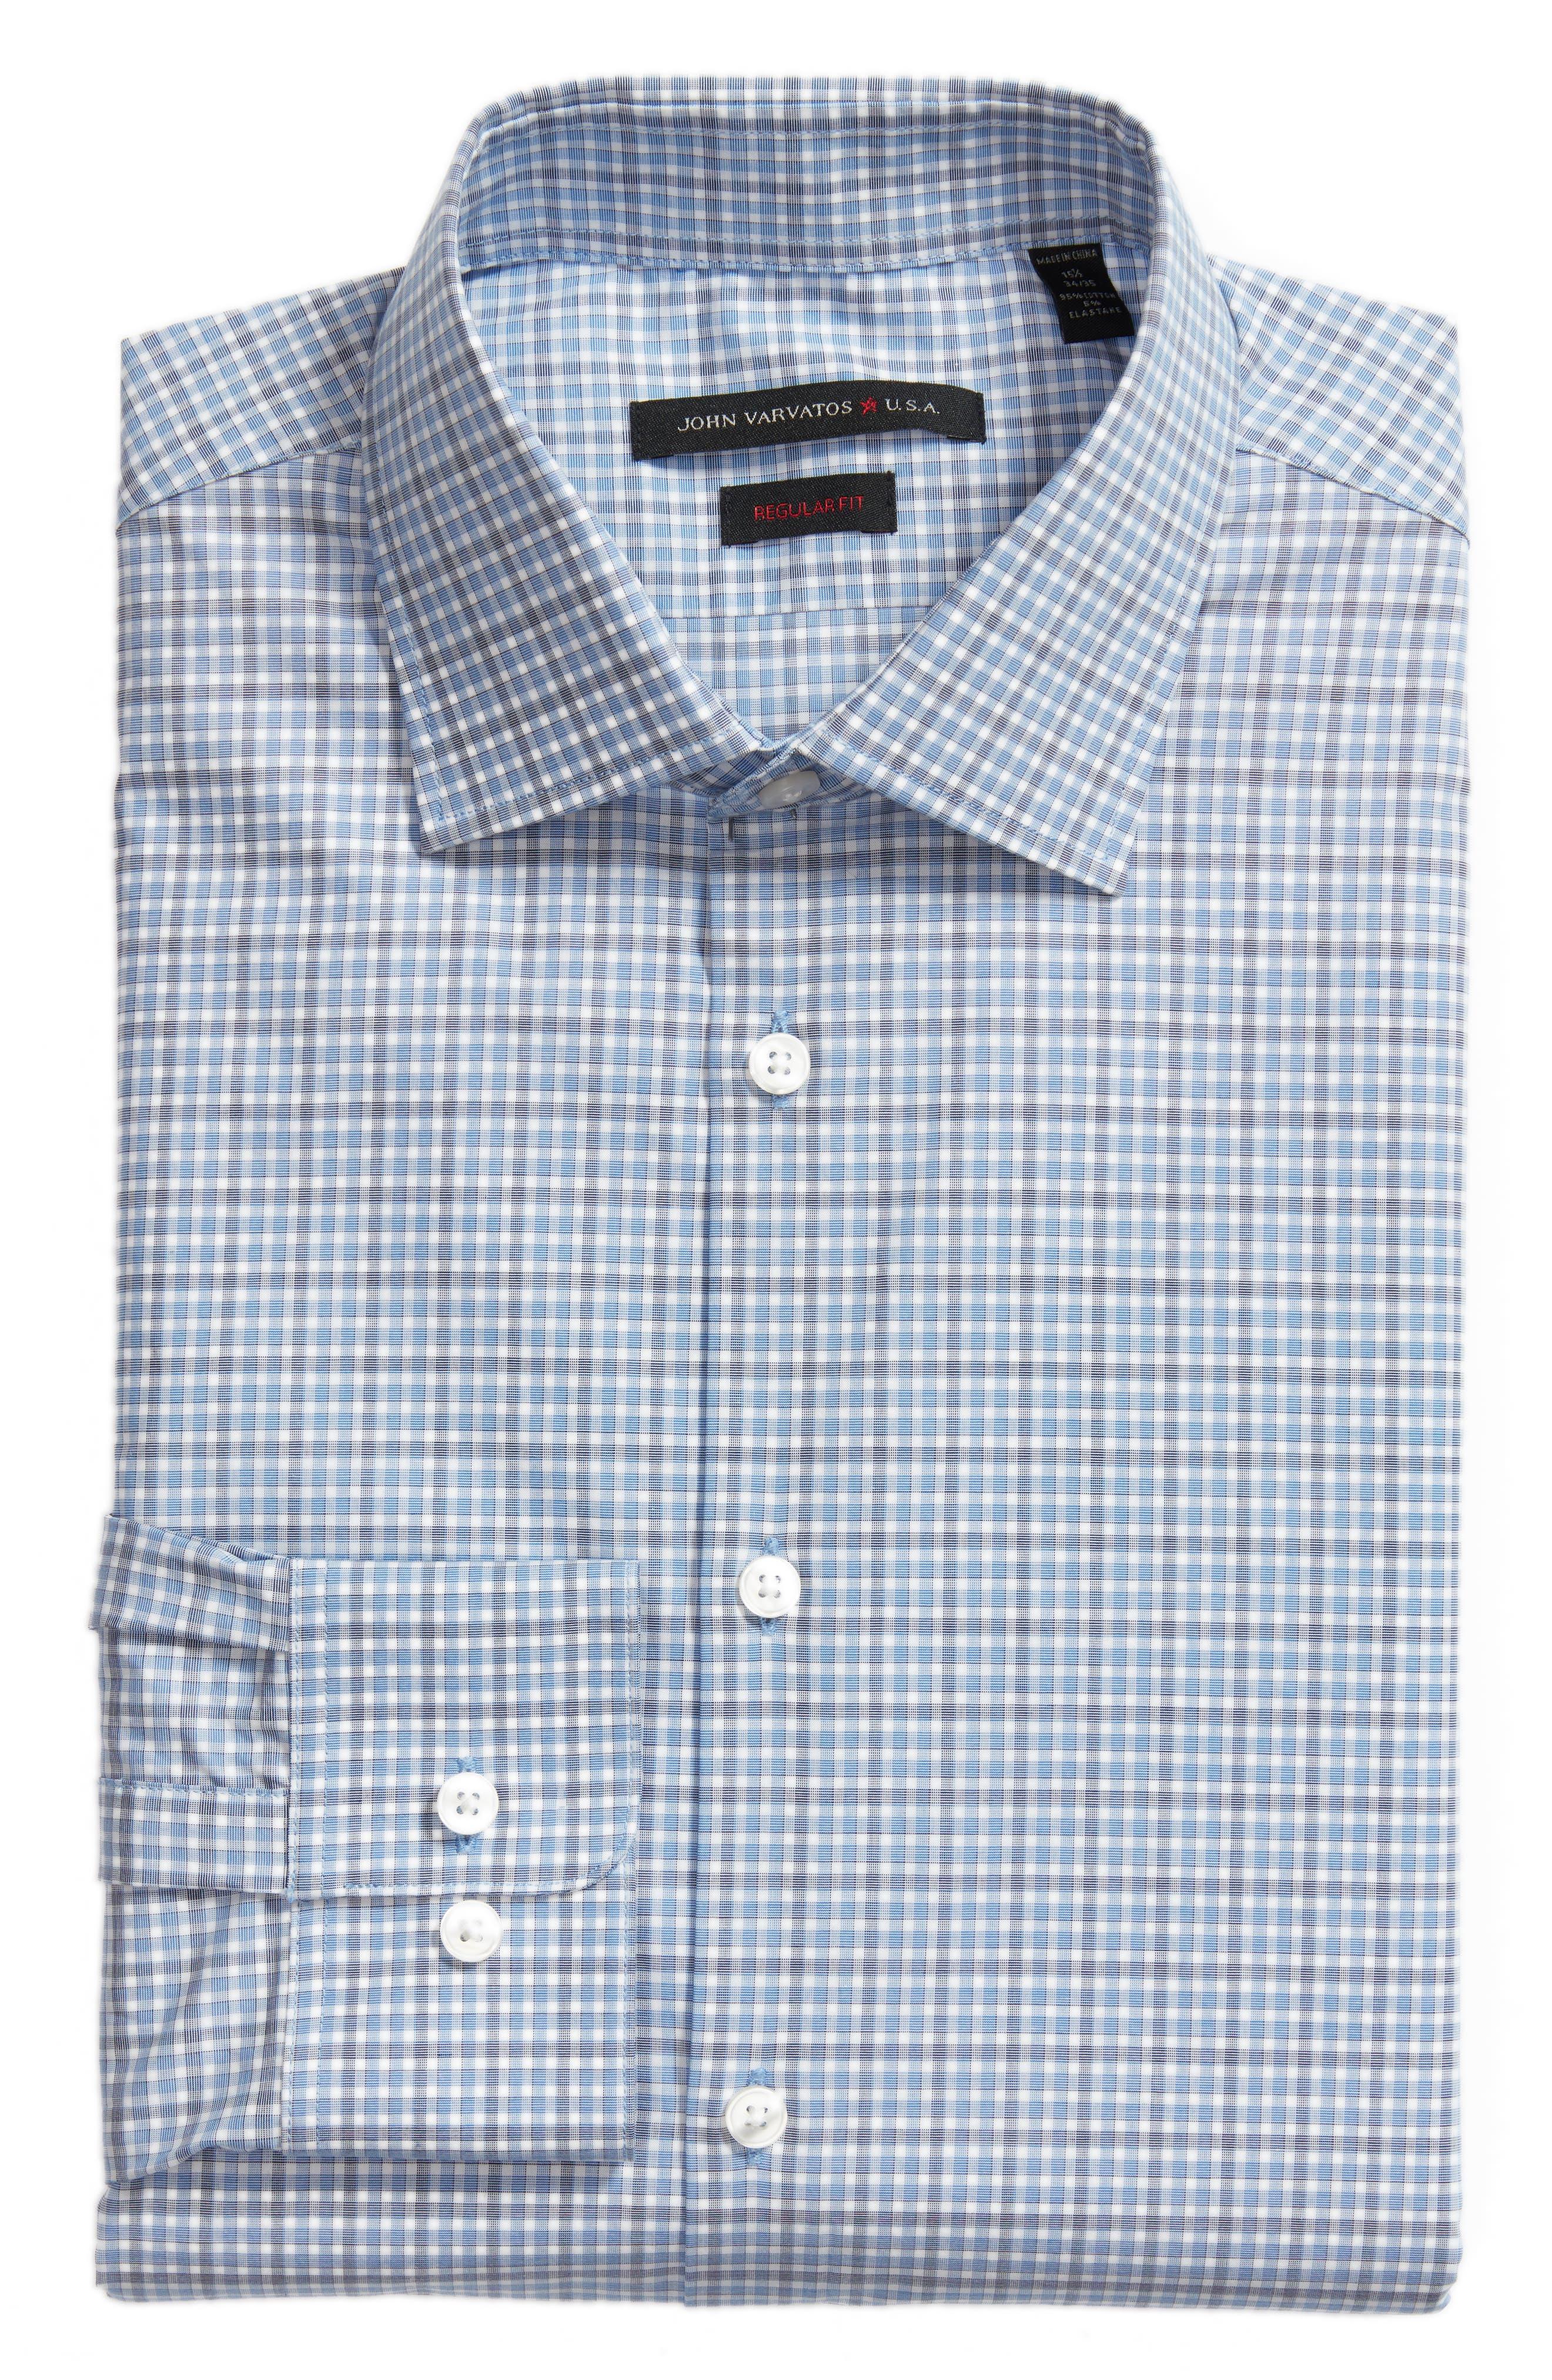 Regular Fit Stretch Check Dress Shirt,                             Alternate thumbnail 5, color,                             SKY